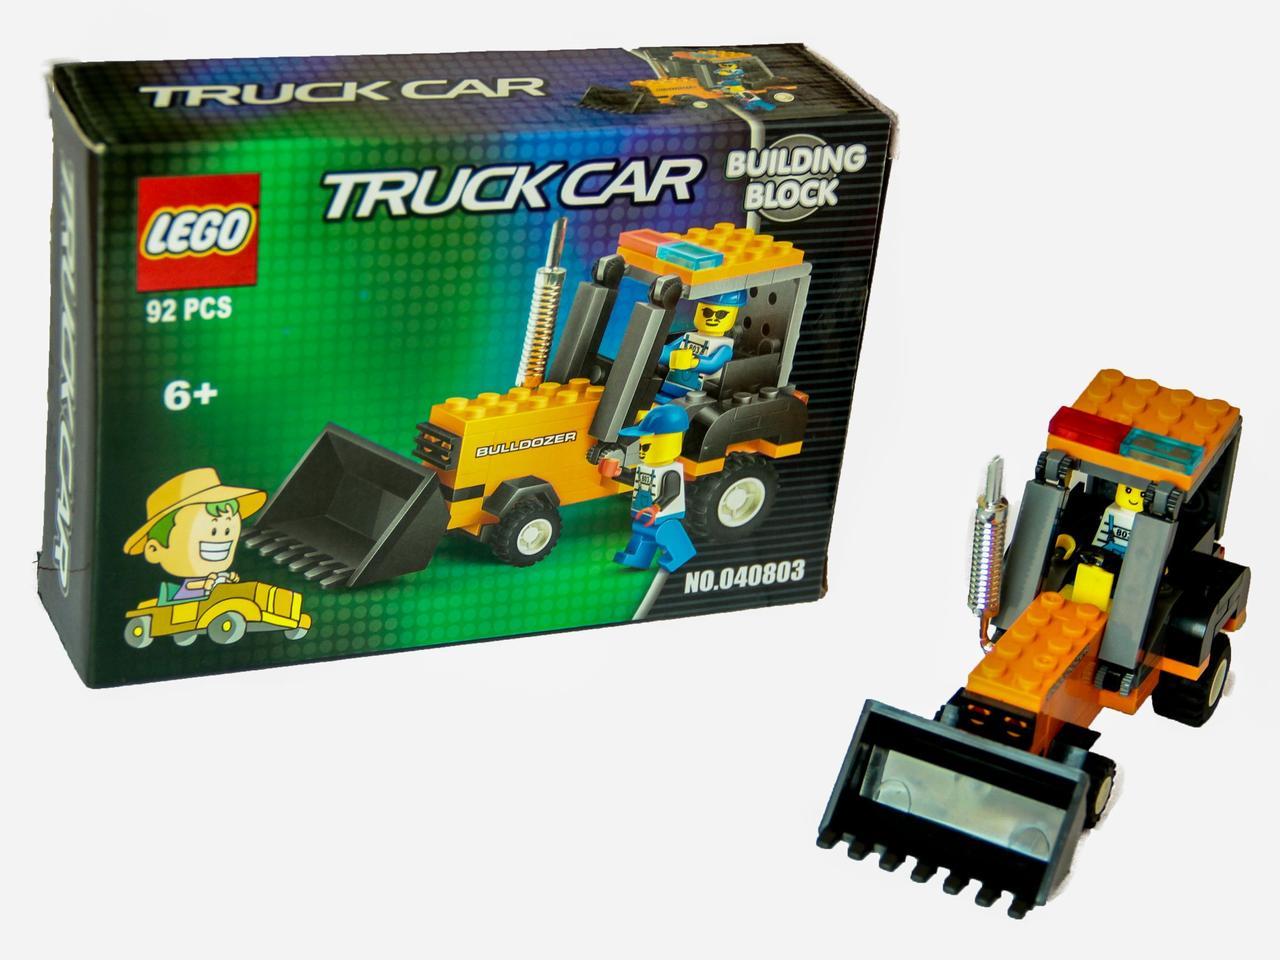 Конструктор LEGO Truck Car Bulldozer + LEGO Truck Car (20181116V-1075)